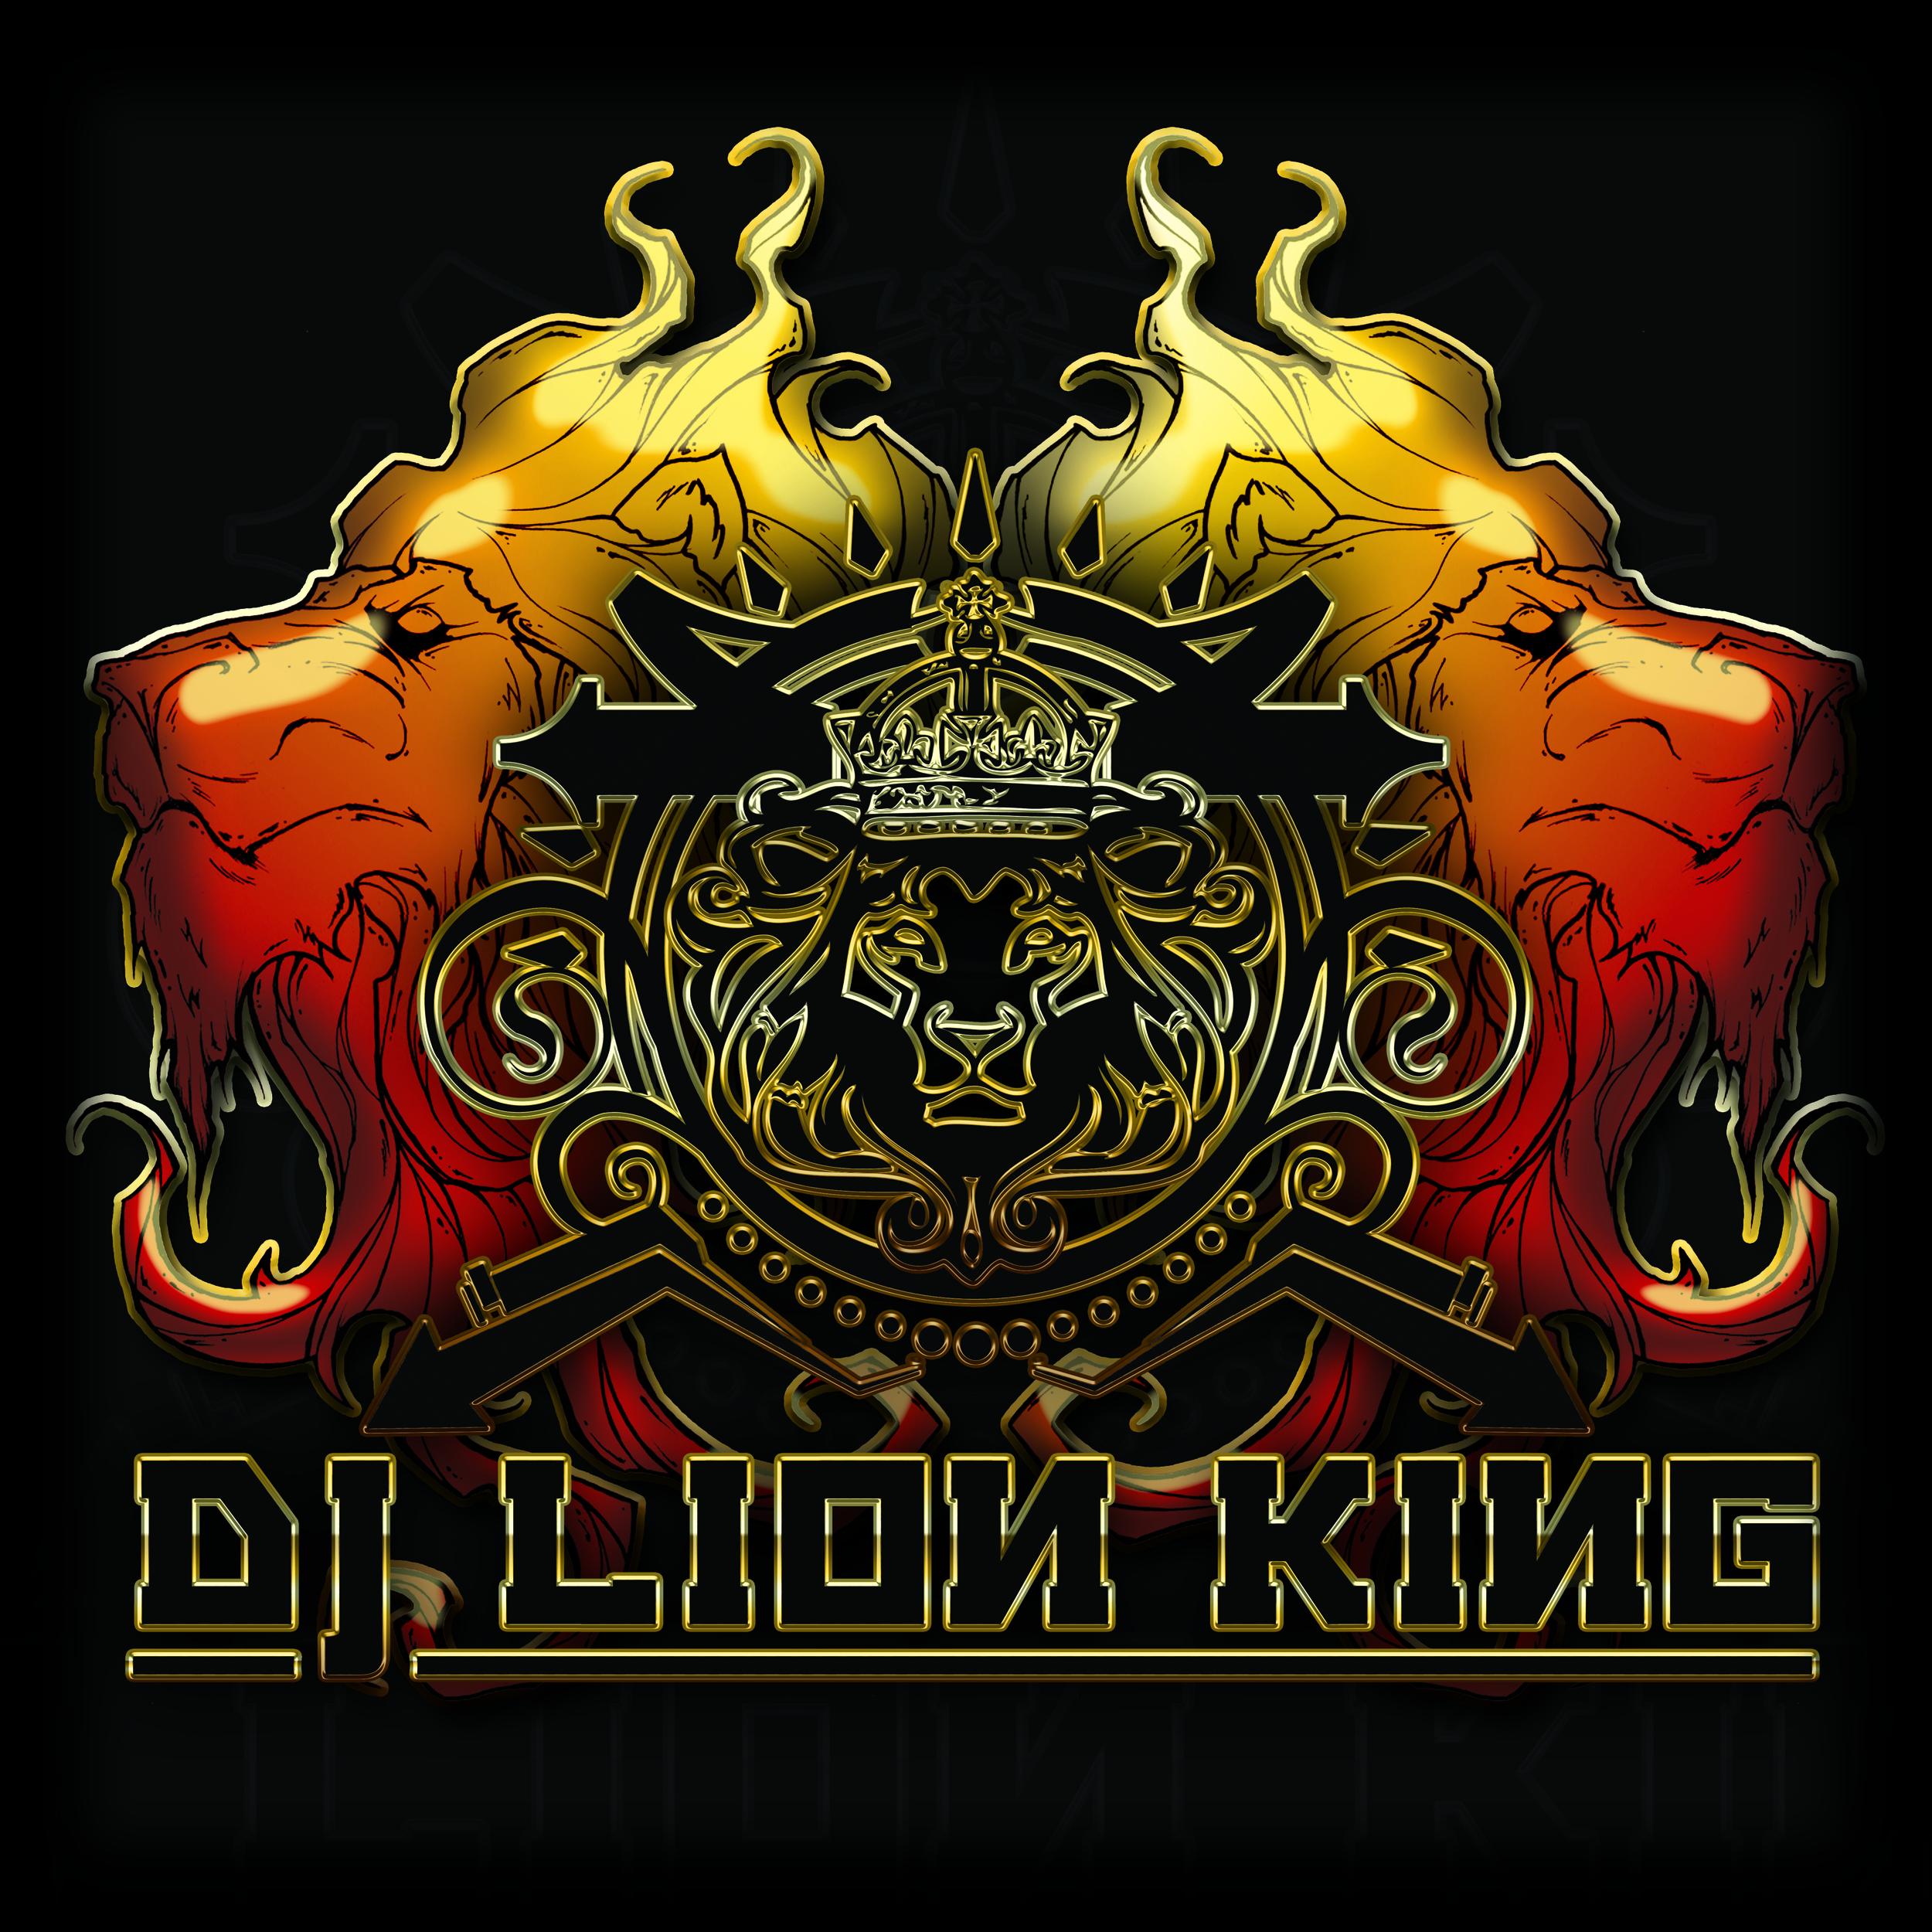 lion king master cover copy 4.jpg